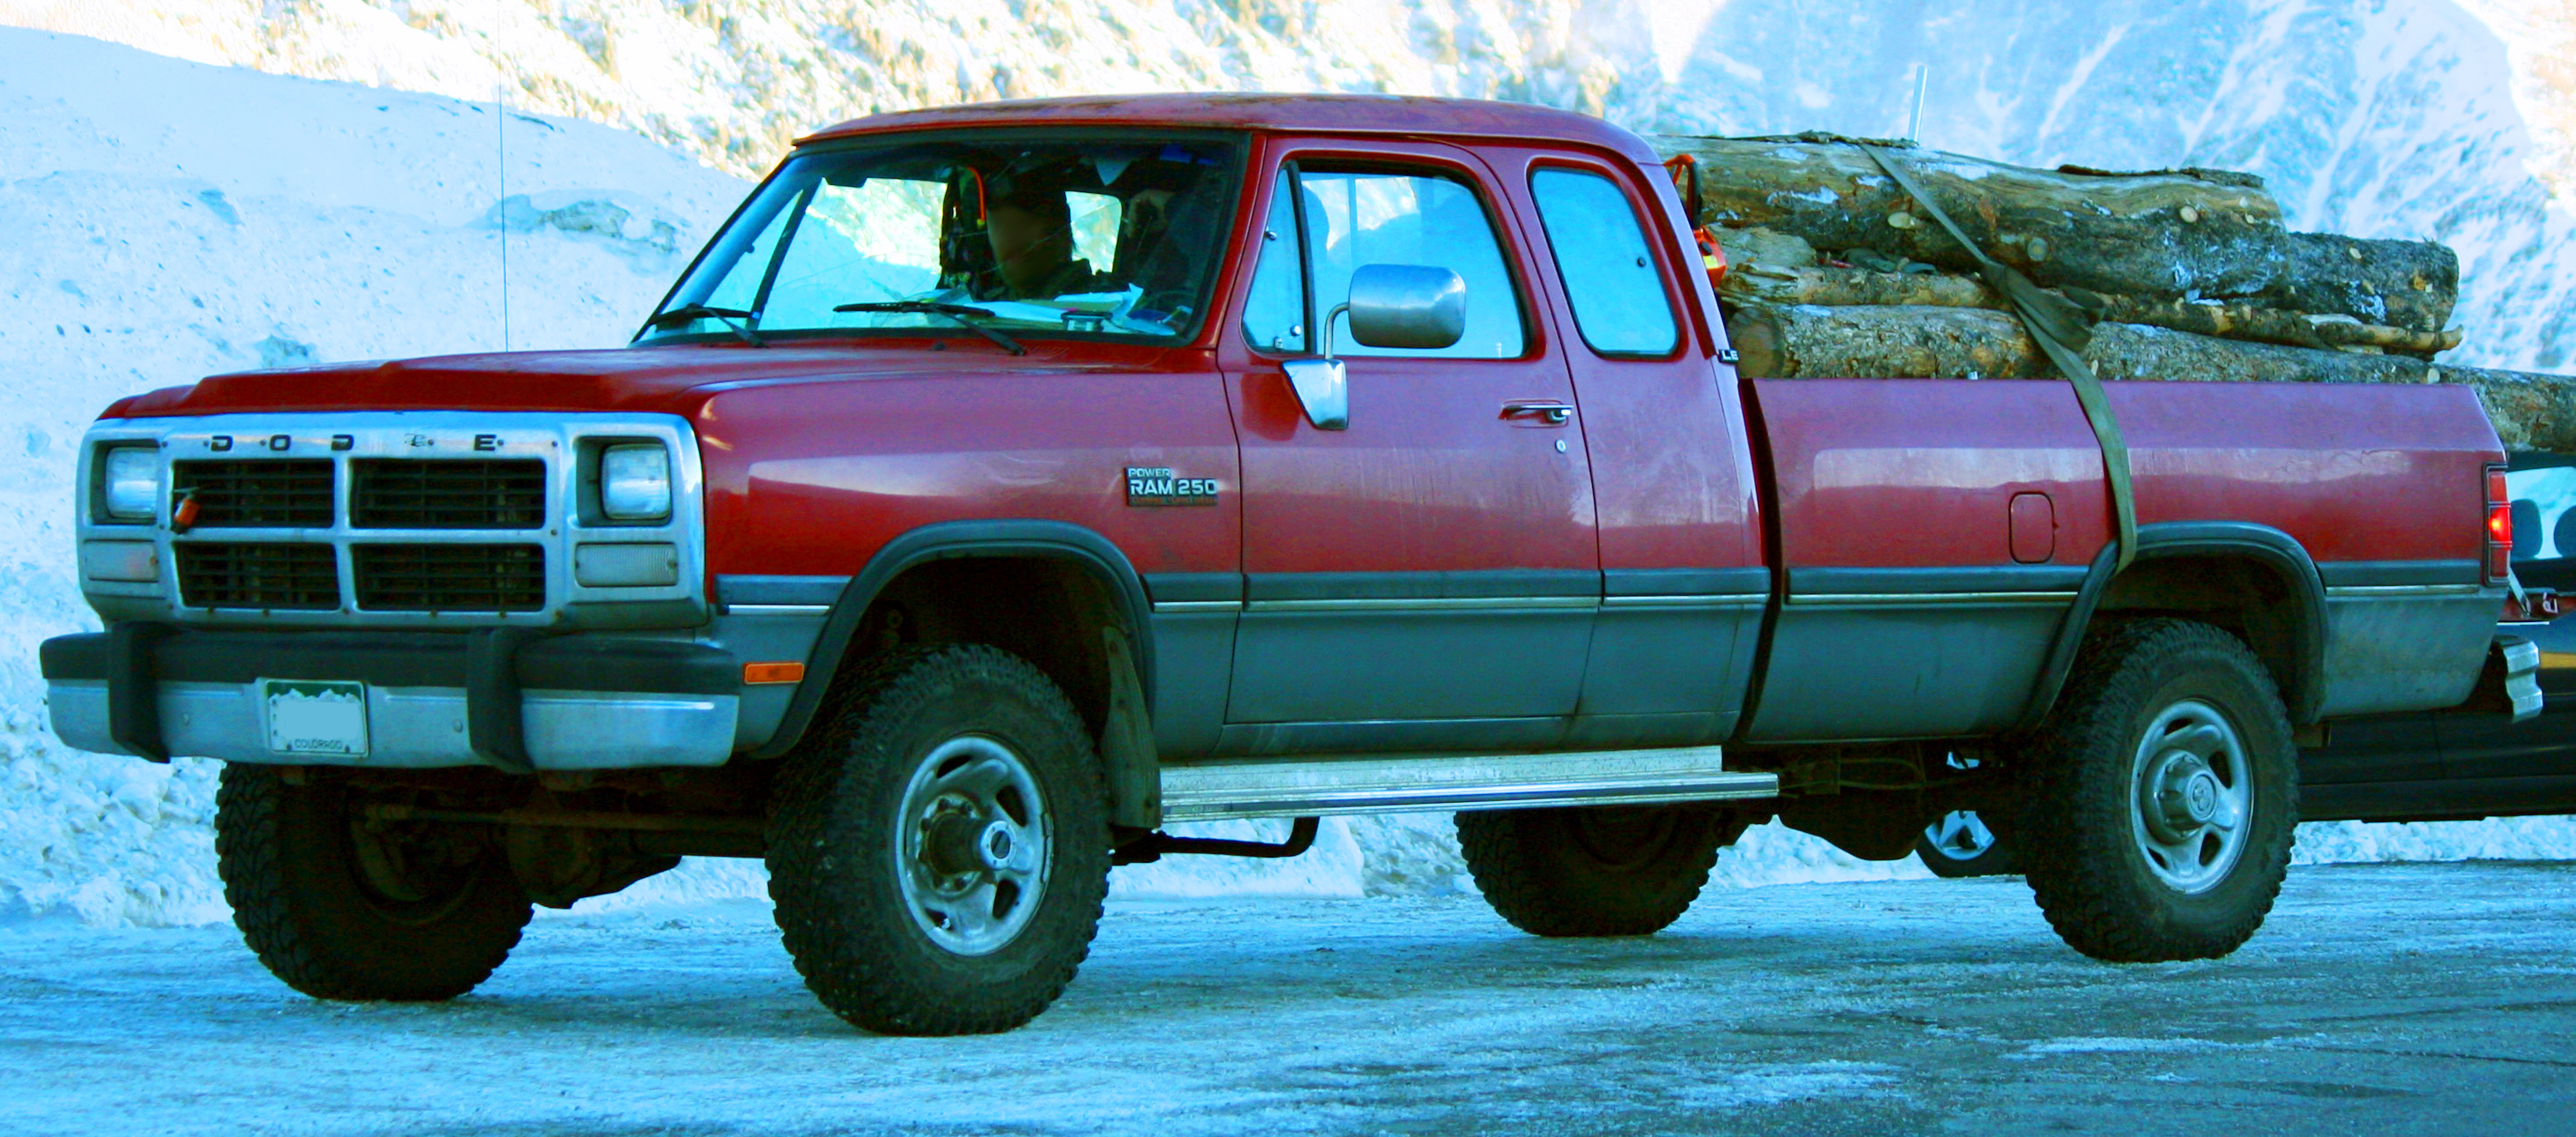 93 Dodge Cummins >> File 1991 93 Dodge Ram 250 Club Cab Cummins Jpg Wikimedia